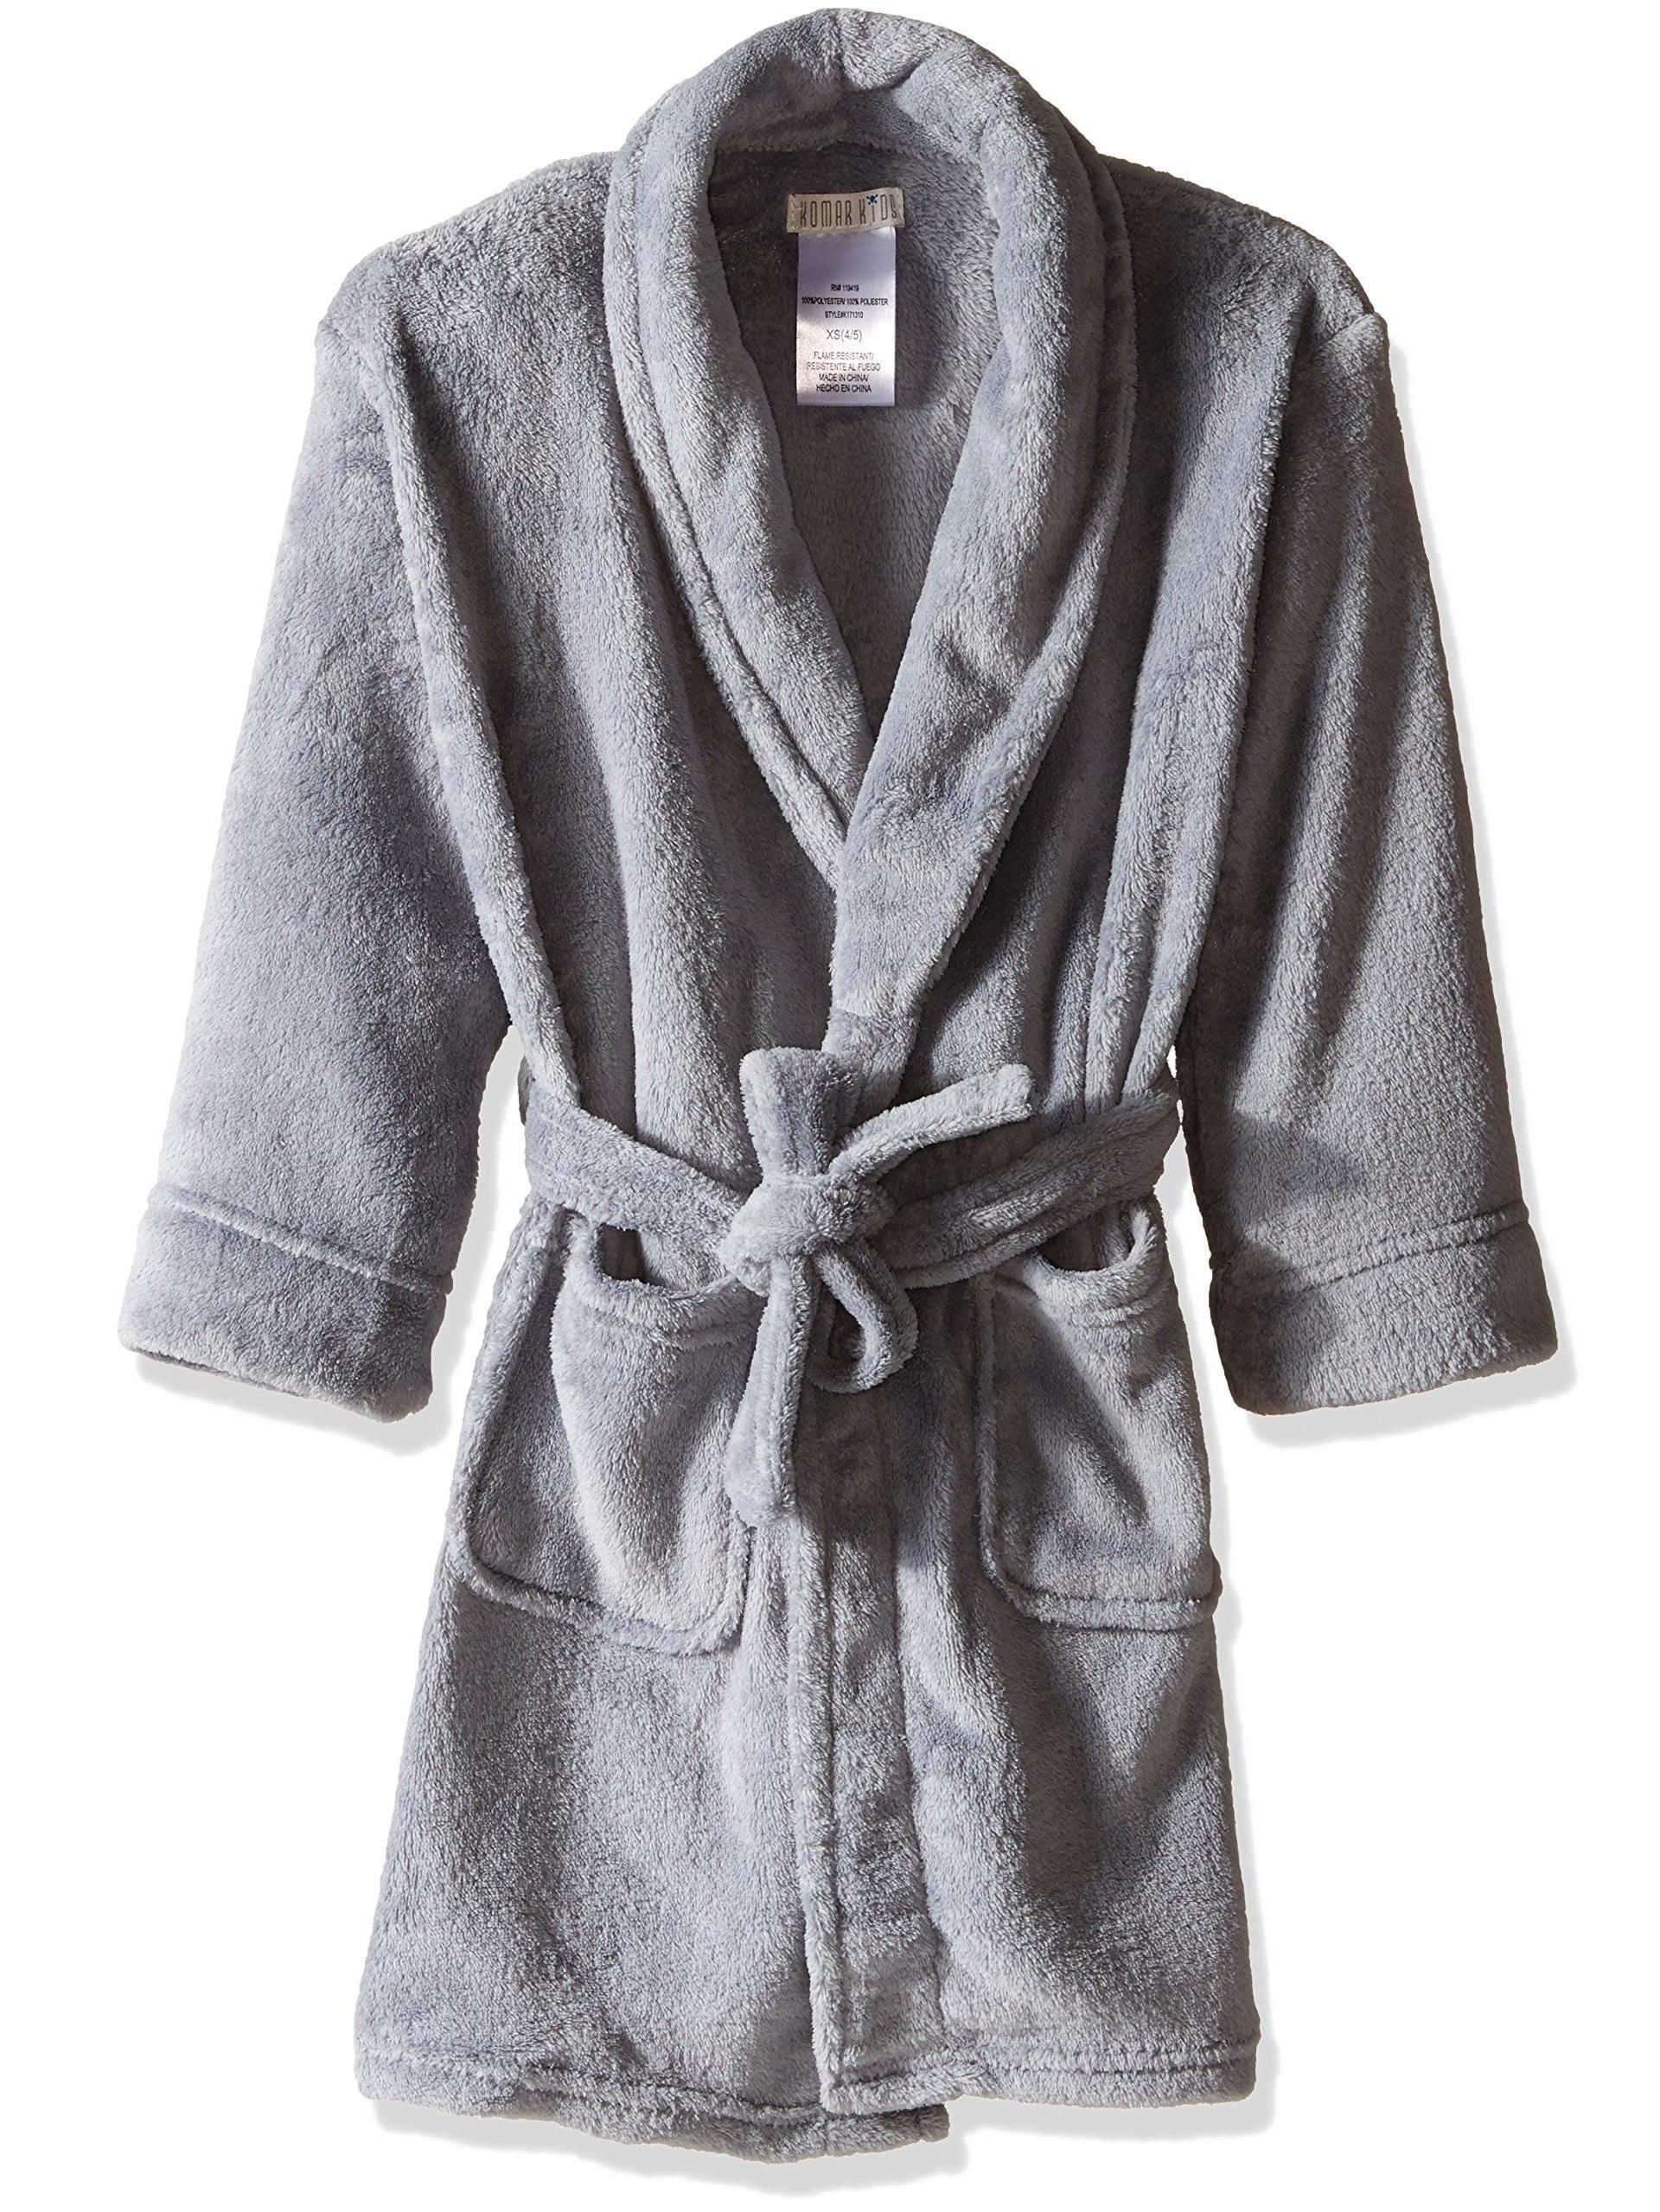 Komar Kids Boys' Fleece Robe Solid Gray, Bathrobe Sizes 4-10